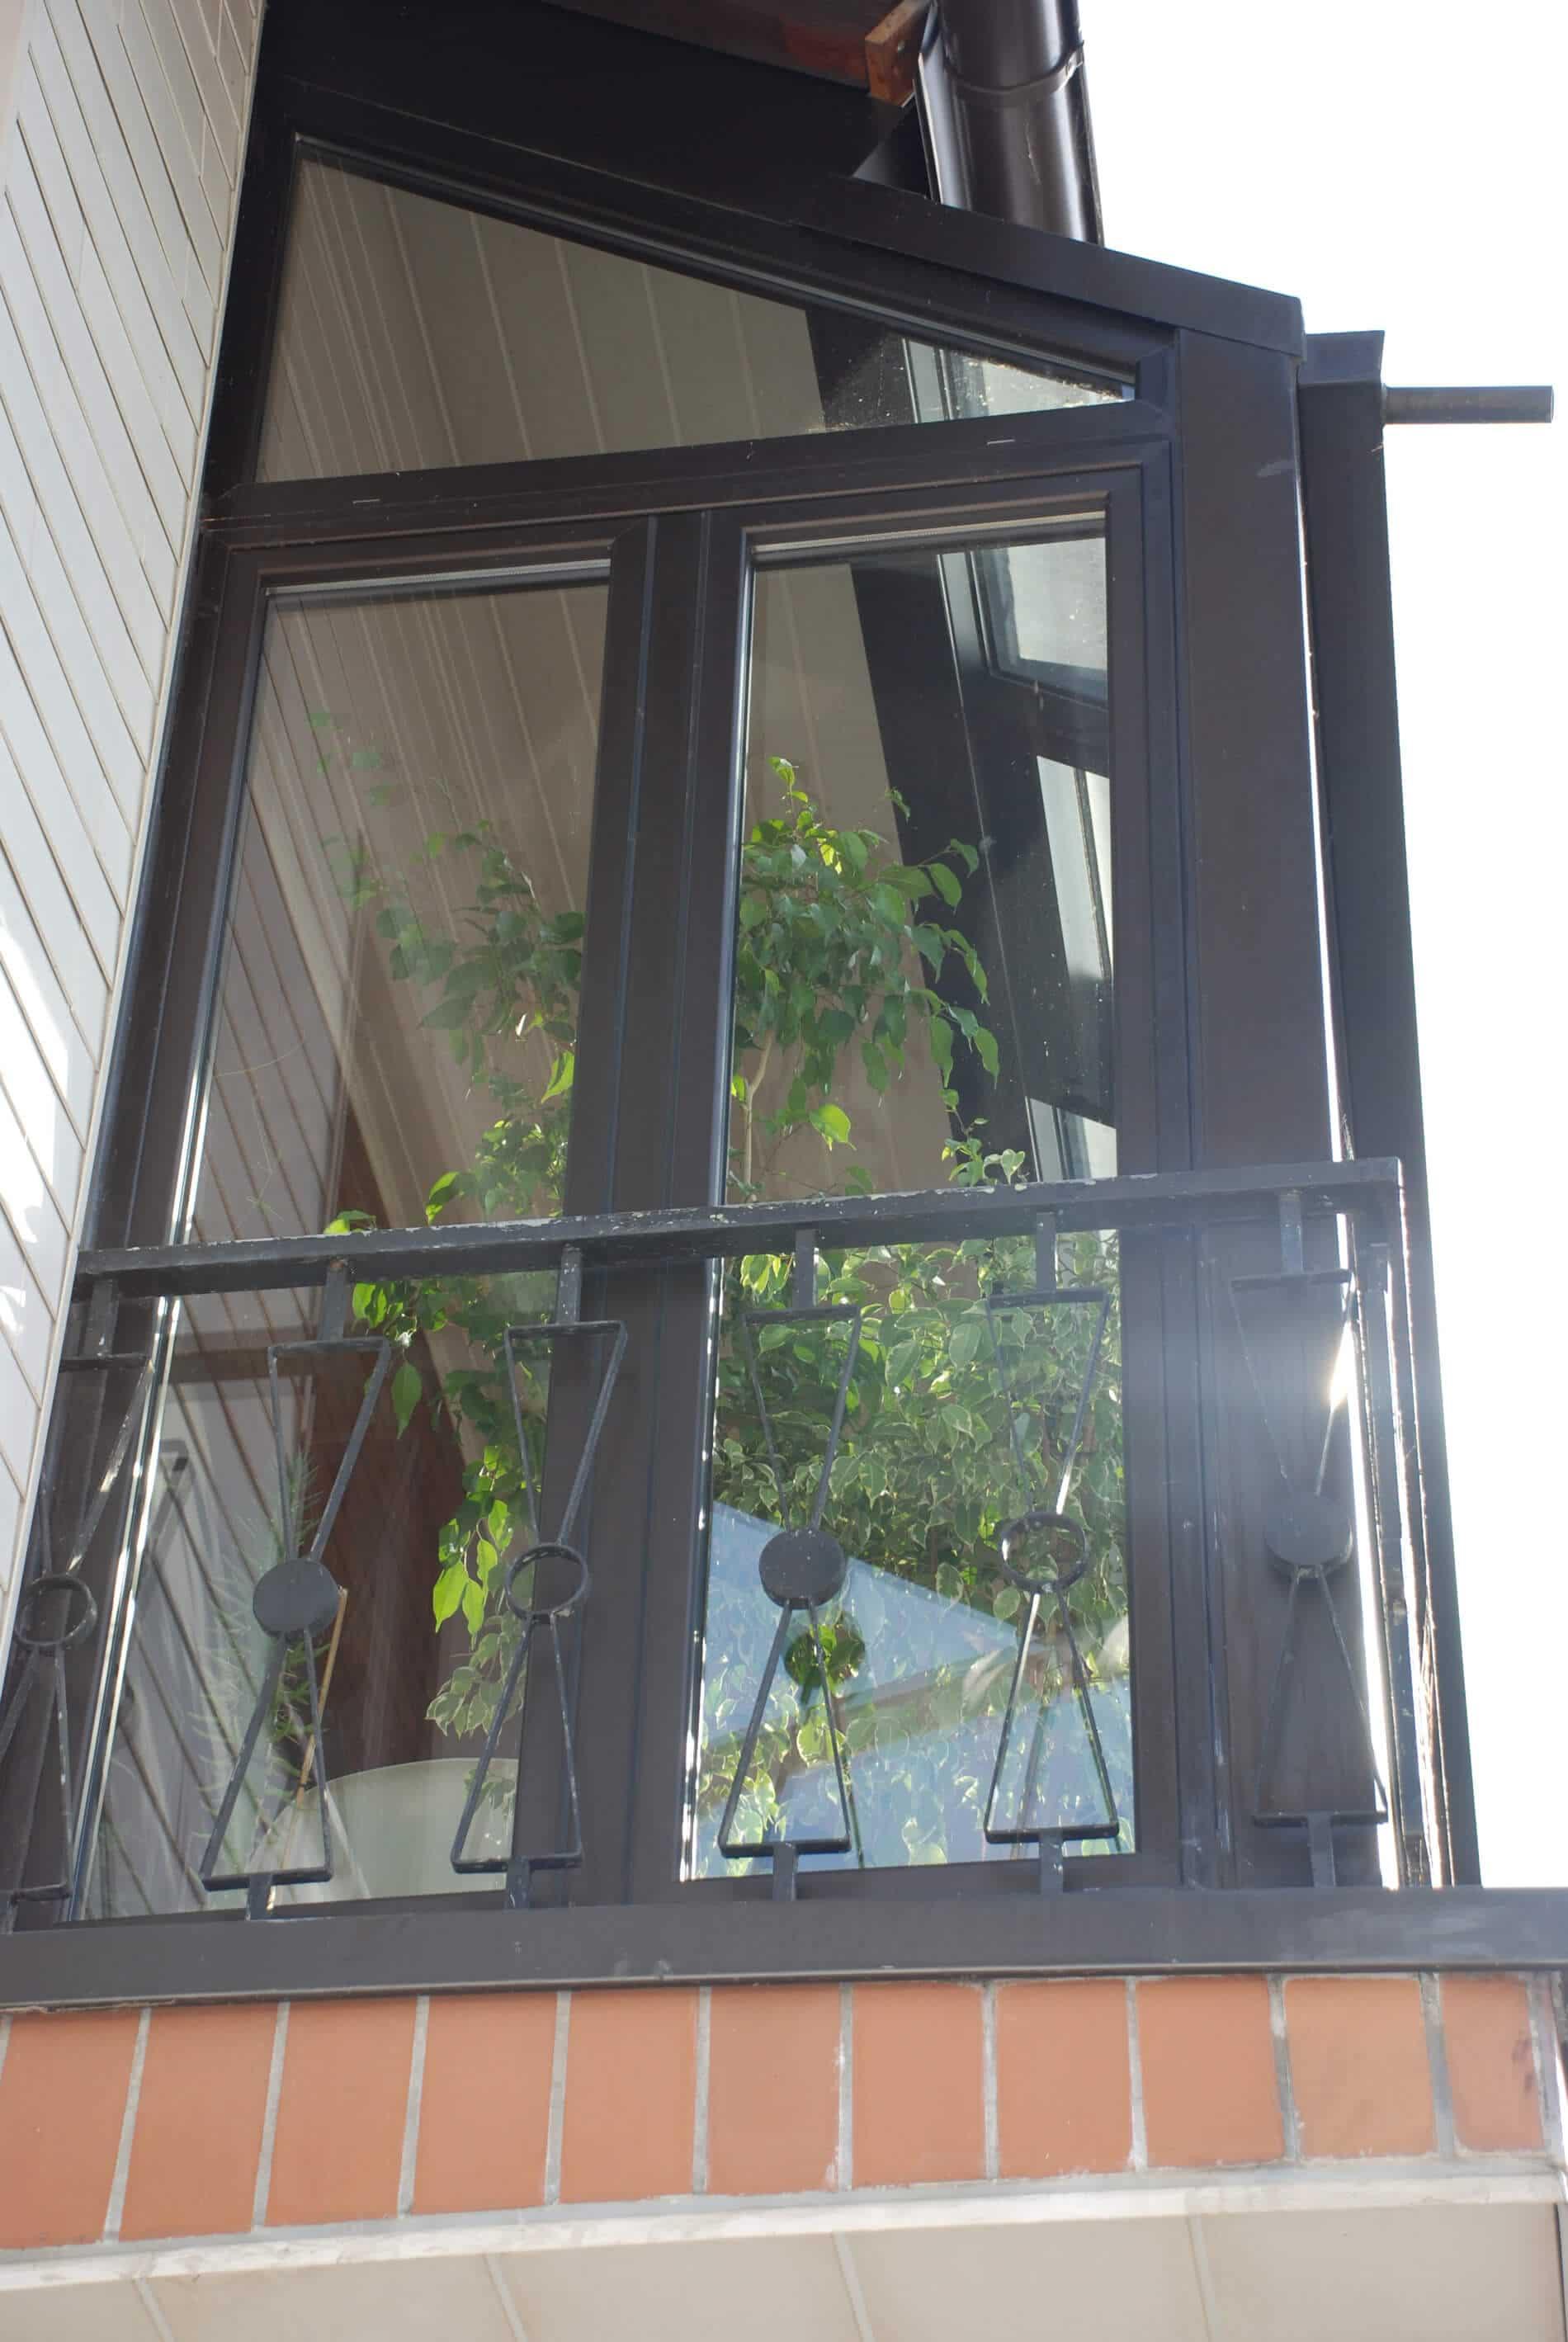 balkon wintergarten dunkelbraun und isolierverglasung wintergarten schmidinger. Black Bedroom Furniture Sets. Home Design Ideas